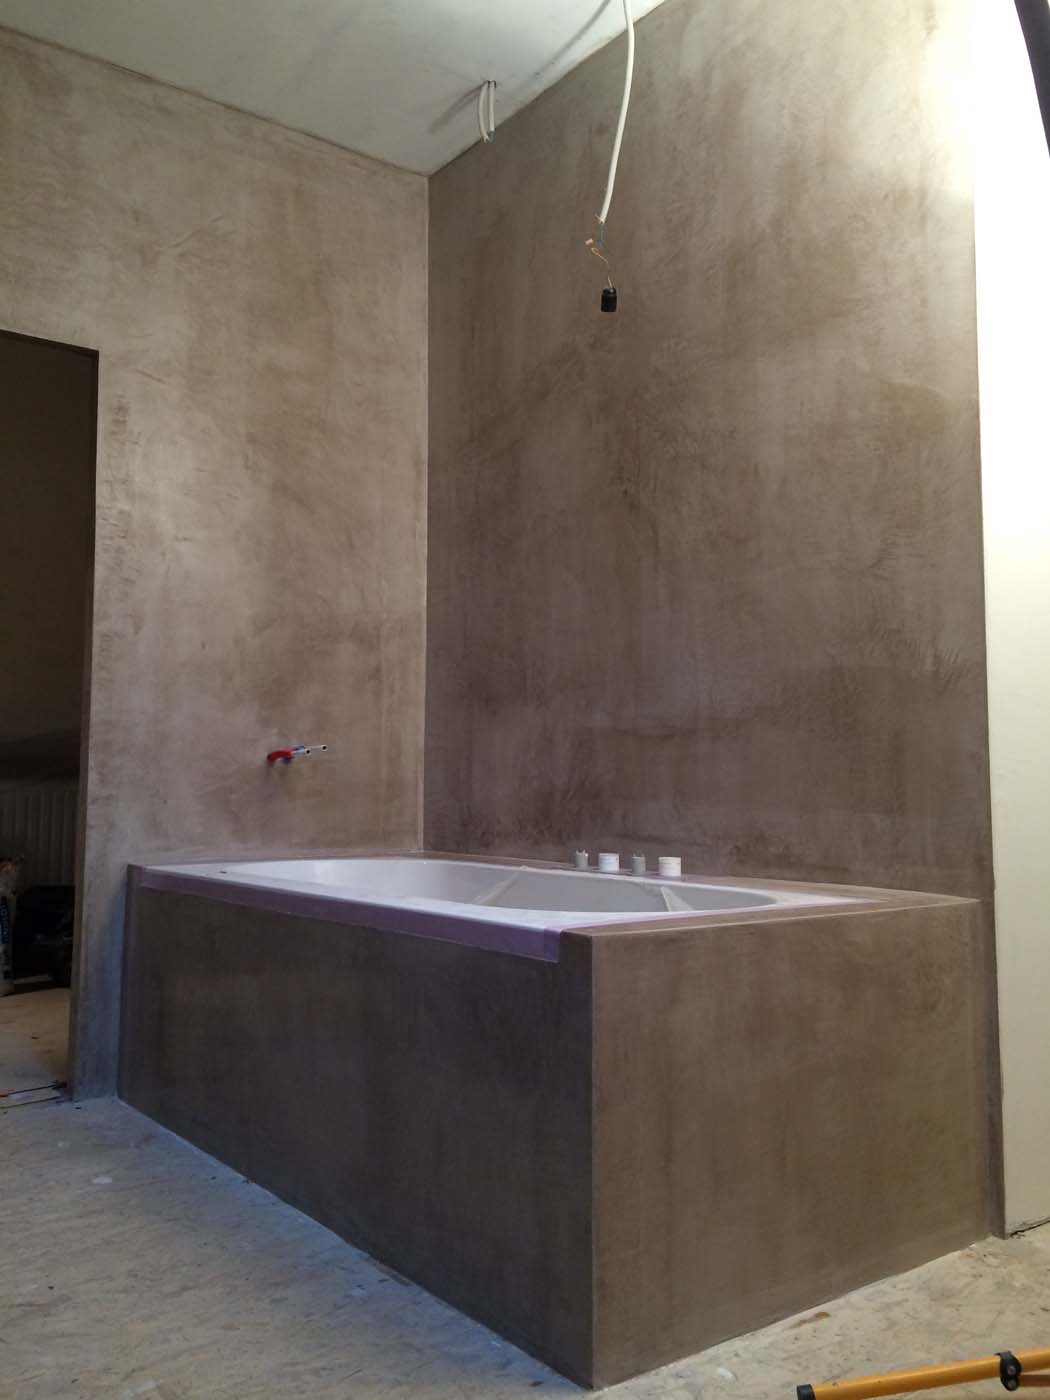 Mortex badkamer douche en meubel Bonheiden